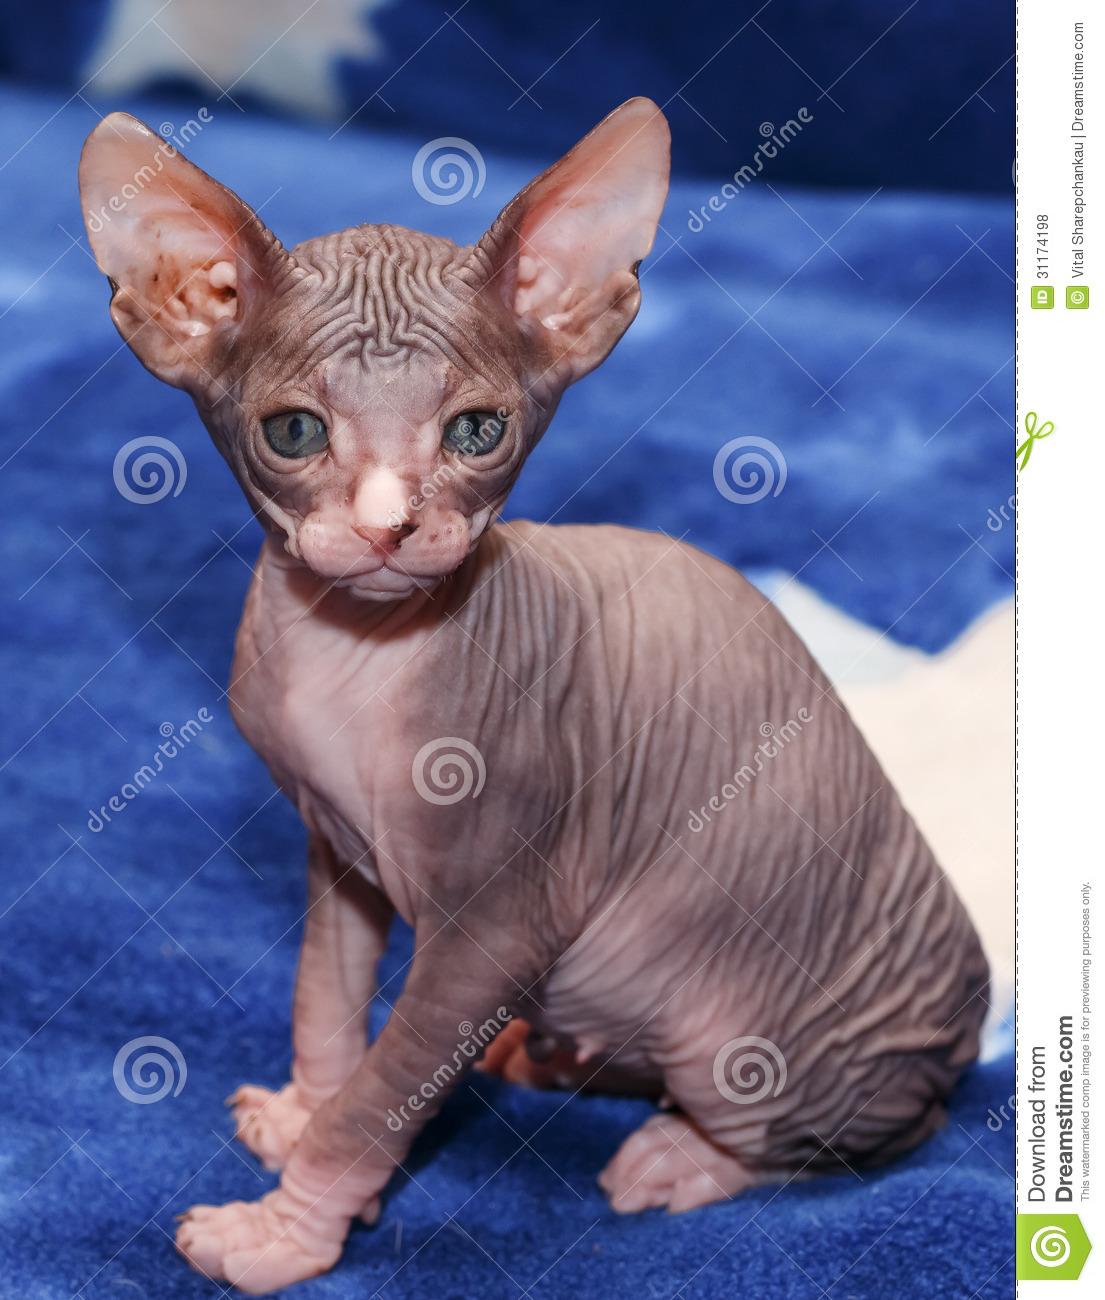 Donskoy Kitten: Donskoy Royalty Free Stock S Donskoy Sphynx Kitten Blue Background Vitebsk Belarus Breed